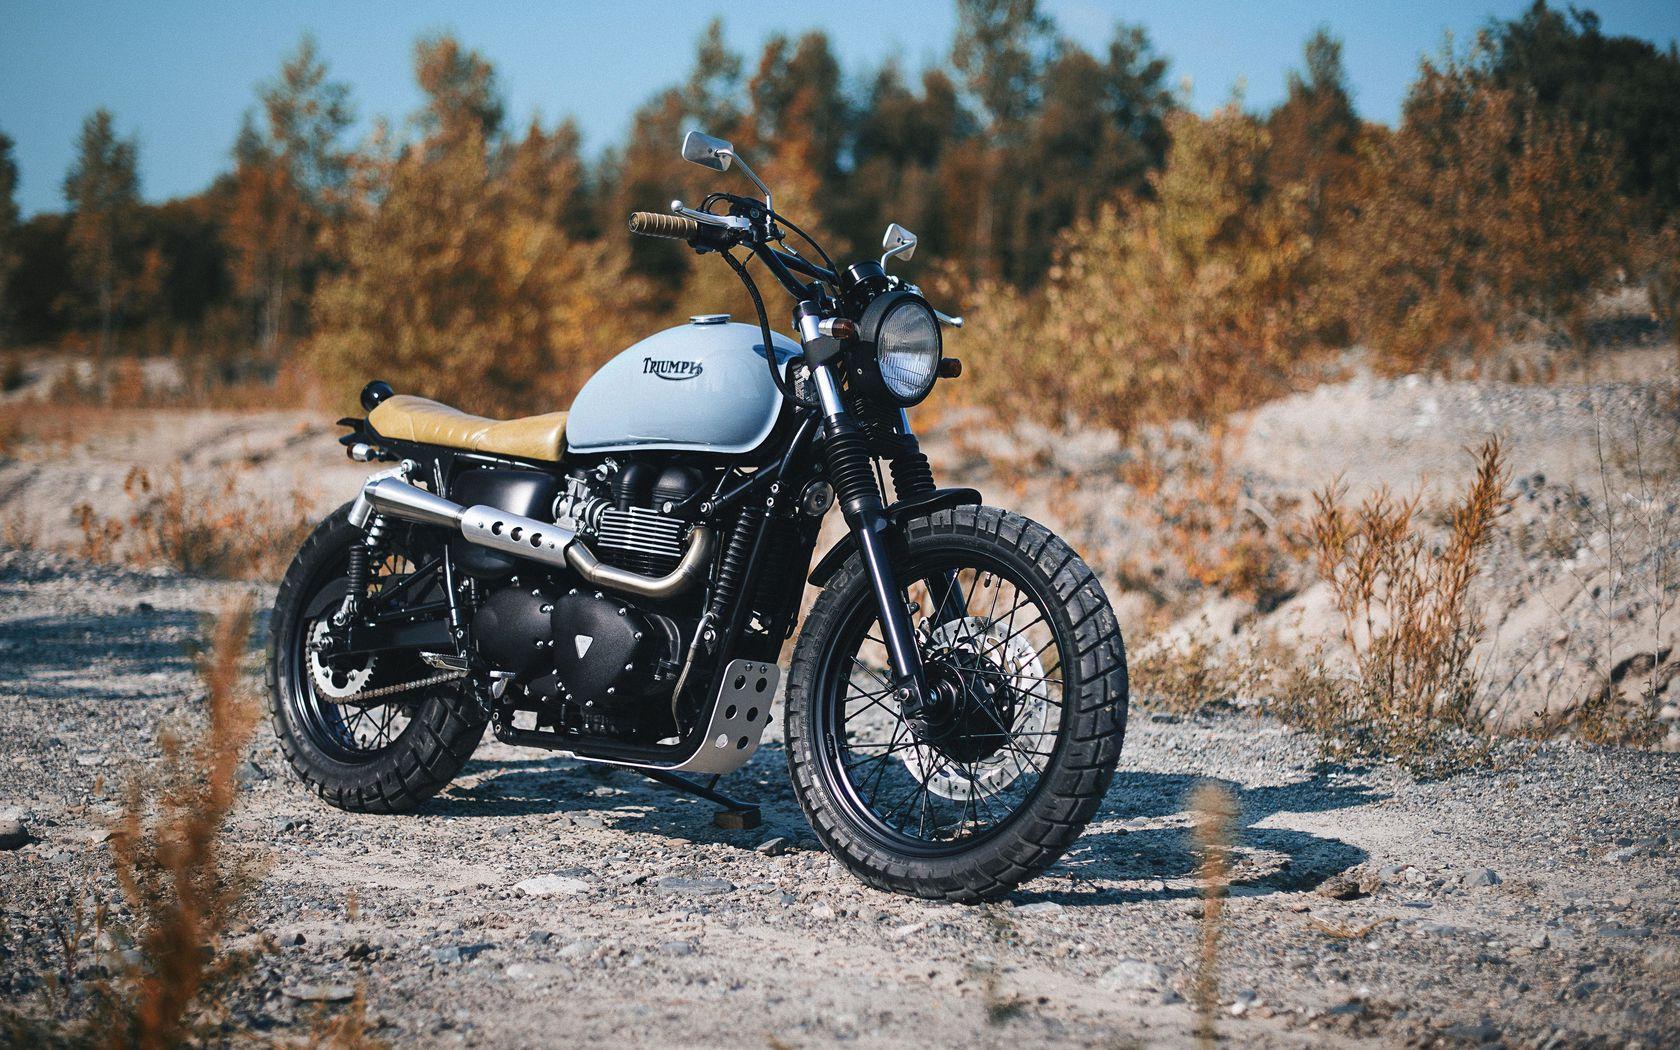 1680x1050 Обои triumph, bonneville, мотоцикл, вид сбоку